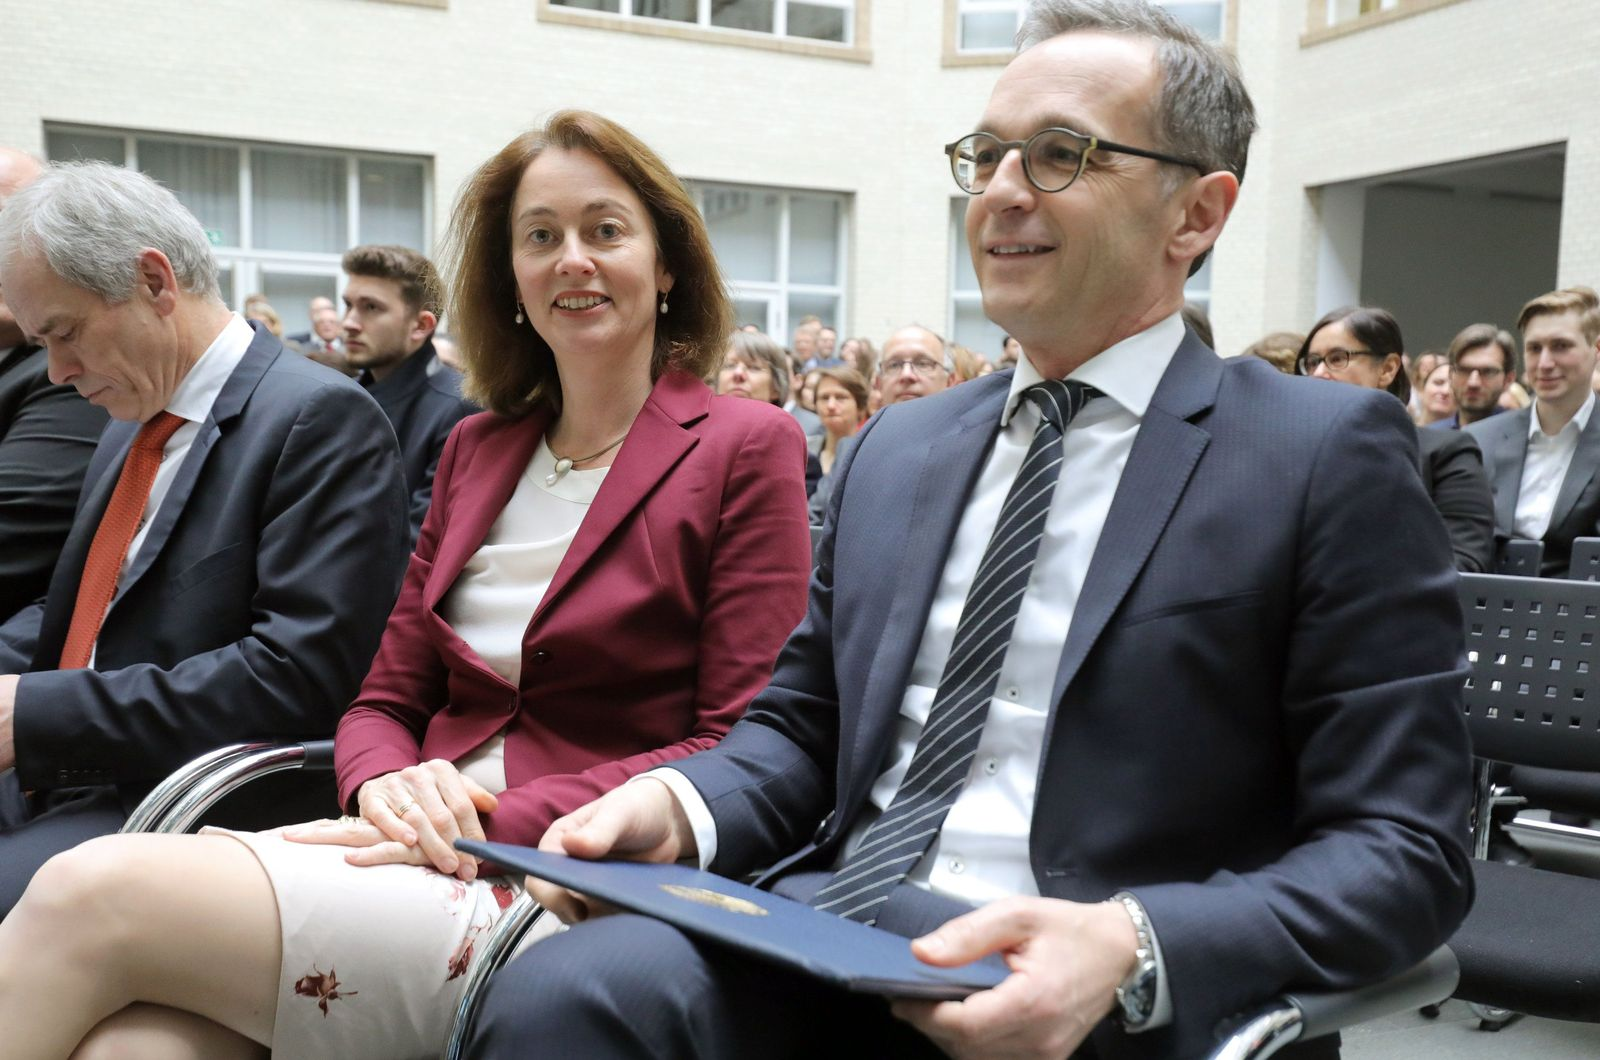 Amtsübergabe Minister Barley / Maas